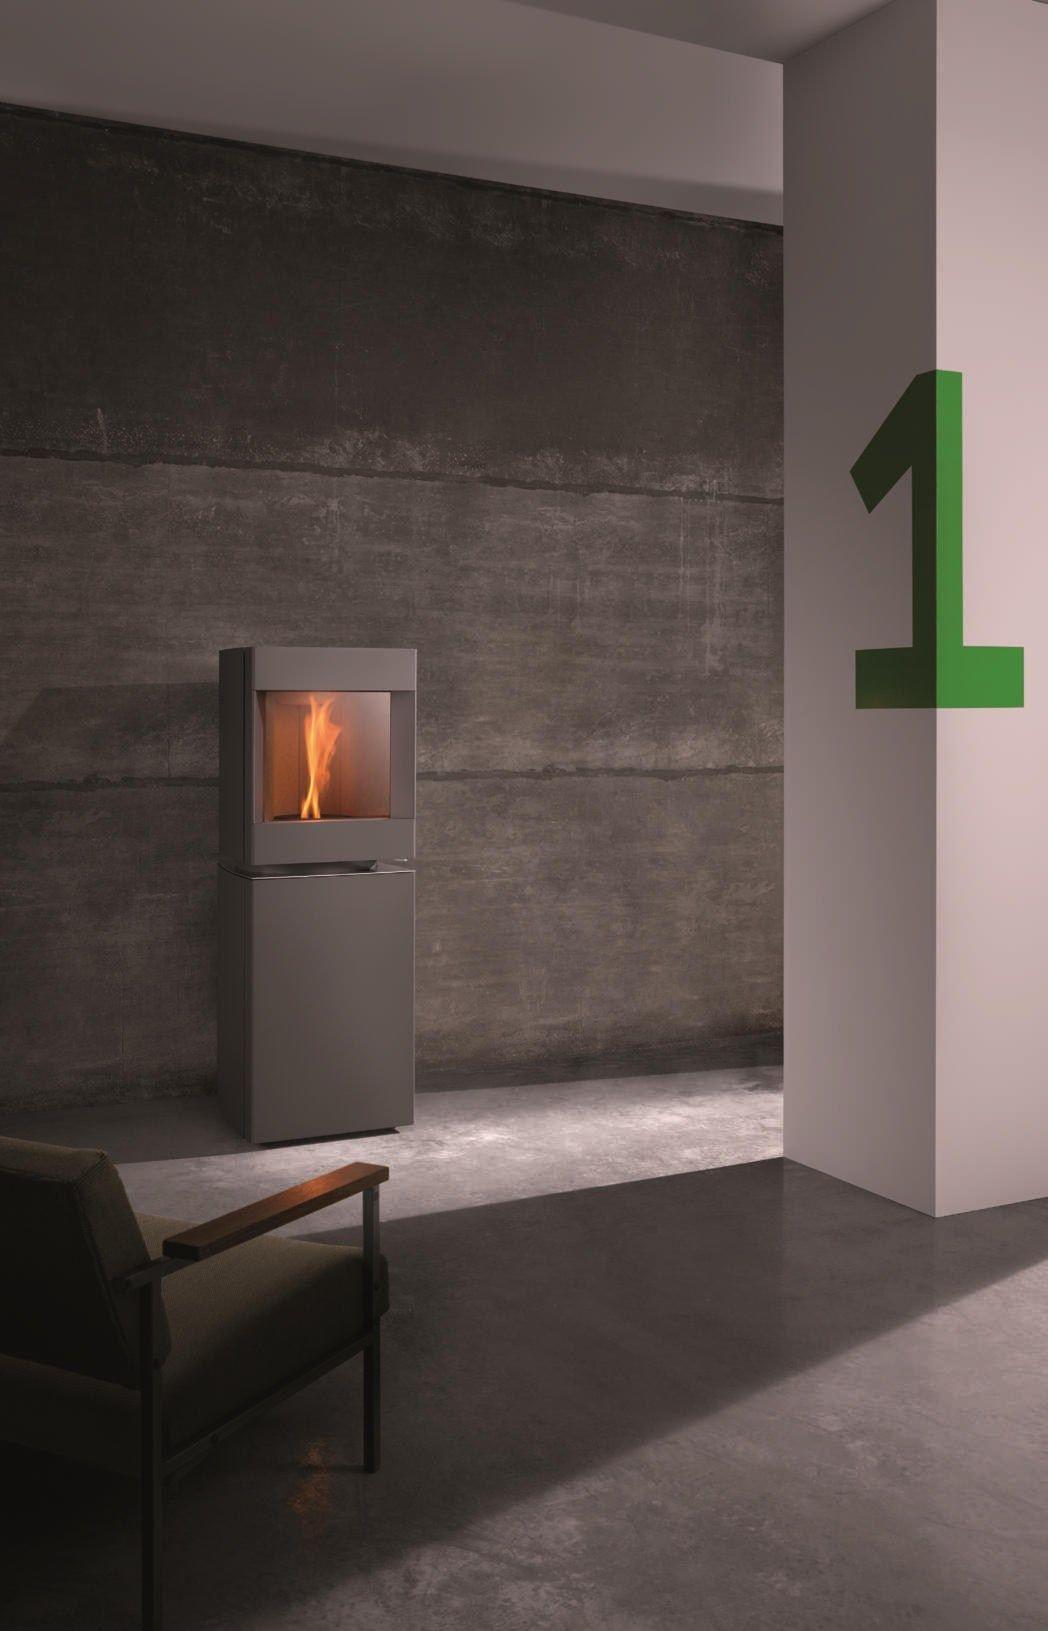 st v p 10 stufa in acciaio by st v. Black Bedroom Furniture Sets. Home Design Ideas